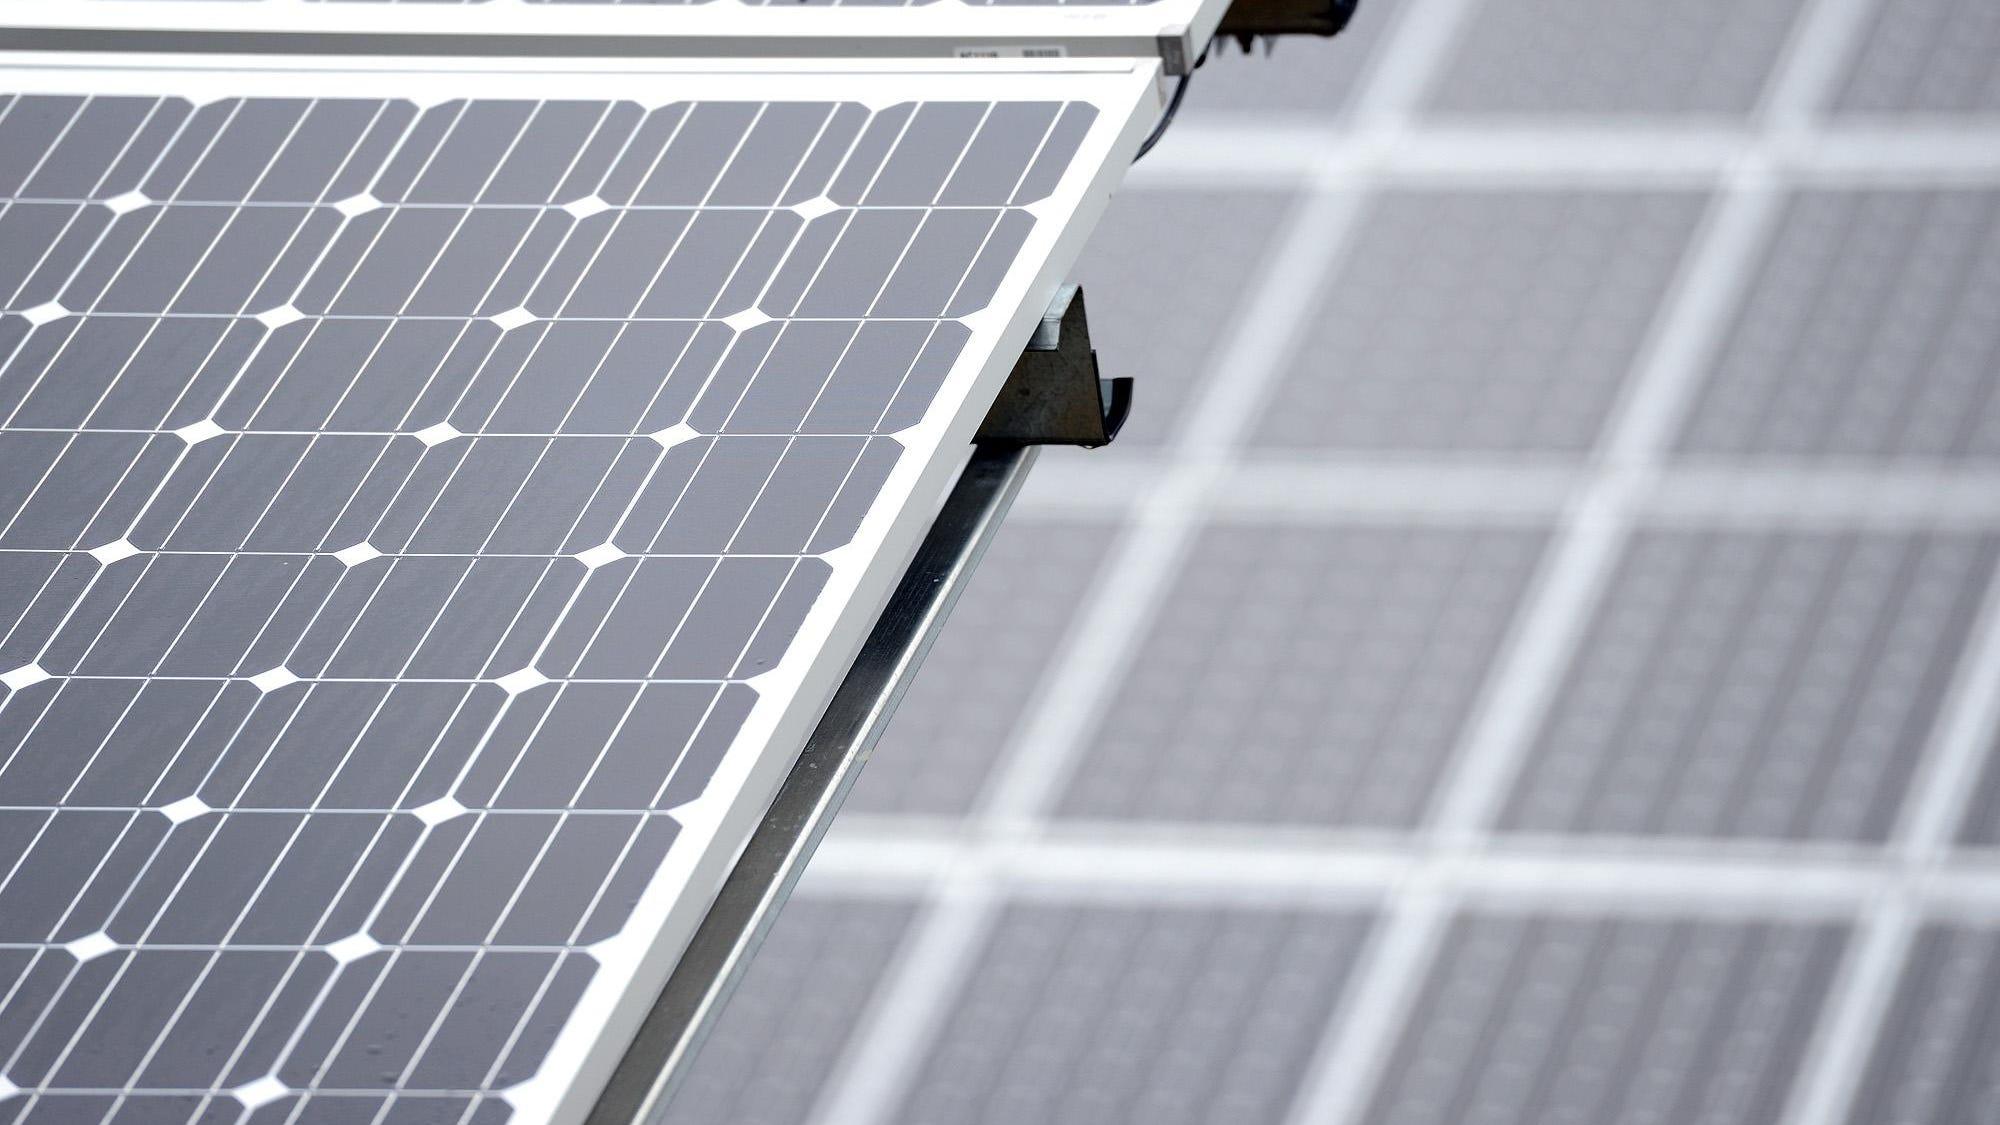 detroitnews.com - Breana Noble, The Detroit News - DTE, Consumers Energy launch community solar education campaign